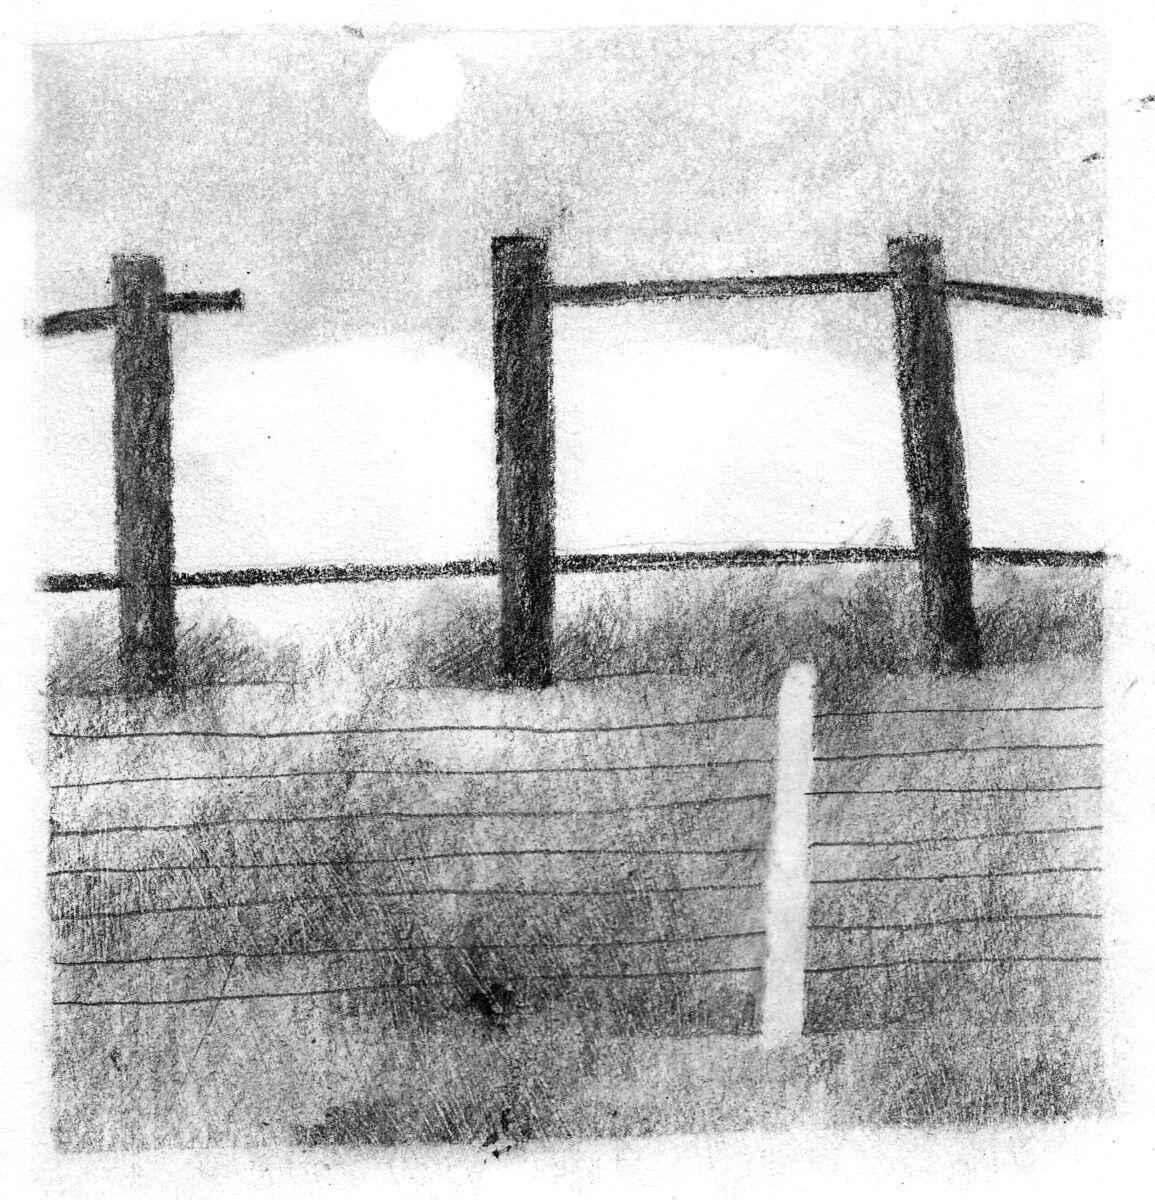 The old deer fence 2